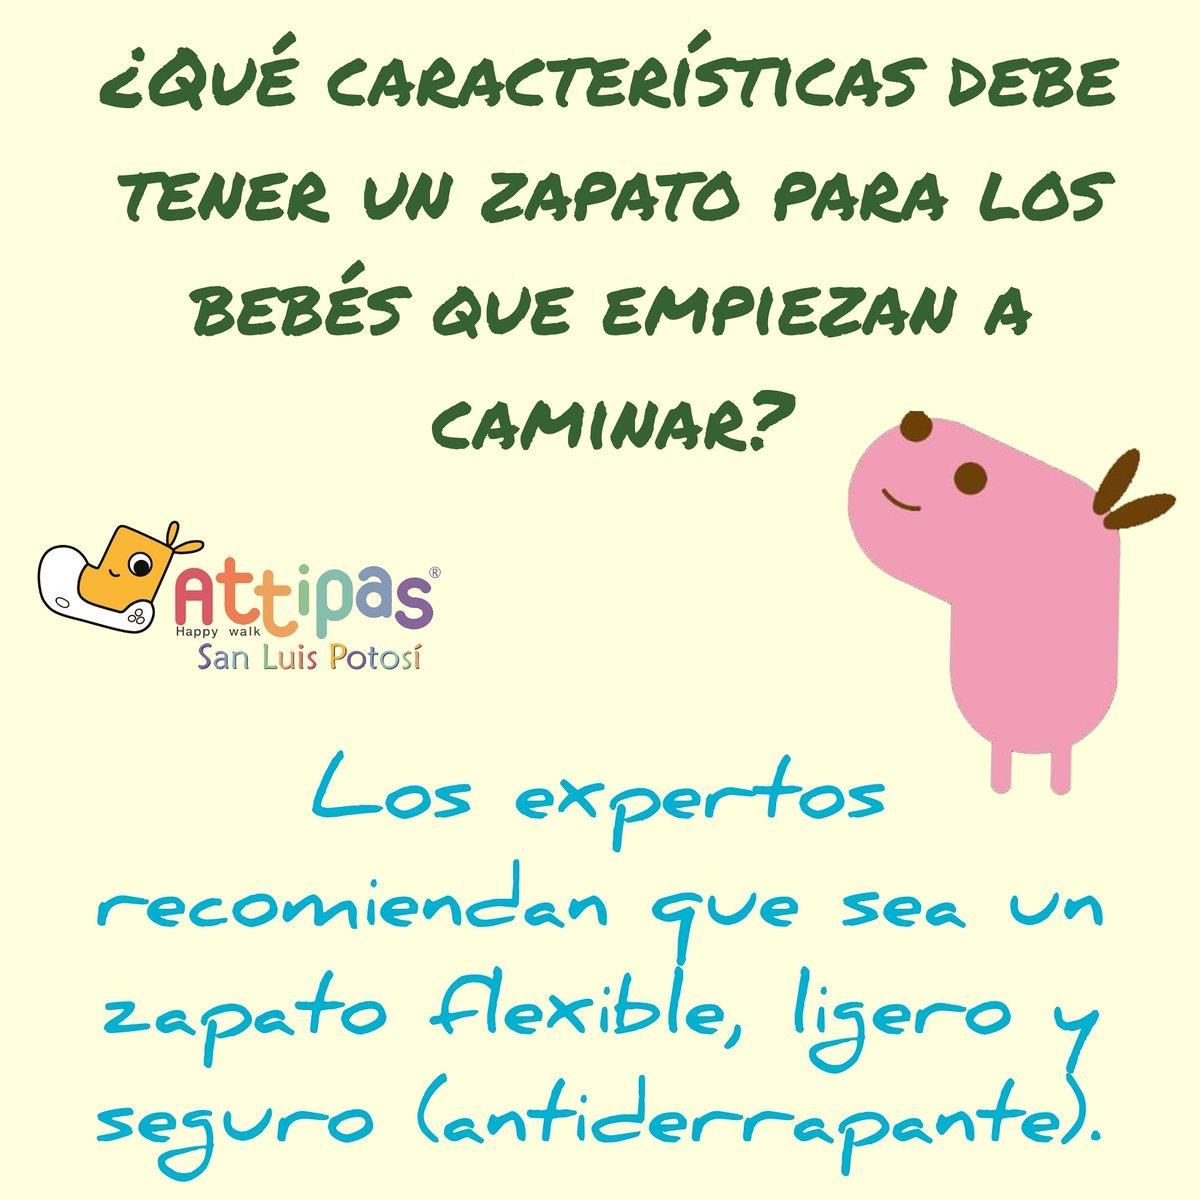 Attipas San Luis Potosí Responde: Son poquitas características pero en verdad muy importantes. Consulta a tu pediatra. #attipas #SanLuisPotosí #México#desdeelpregateo #primerospasos #gateacaminasaltacrececonattipaspic.twitter.com/6JkD2sVETR